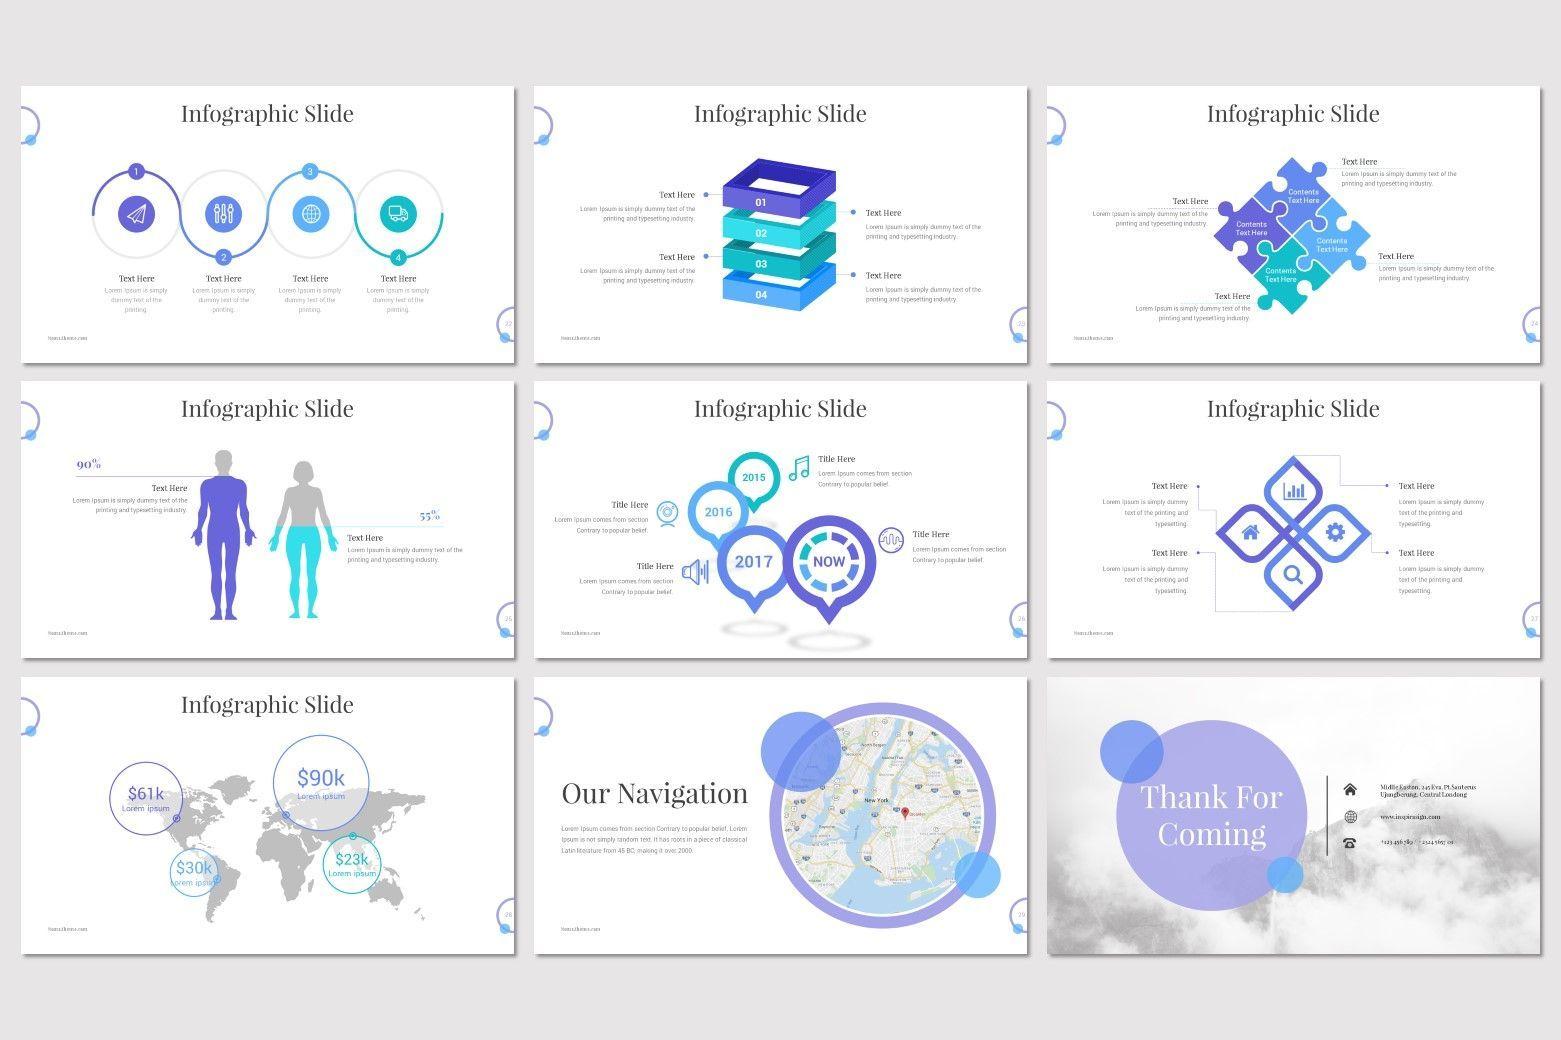 Noma - Google Slides Template, Slide 5, 08302, Presentation Templates — PoweredTemplate.com